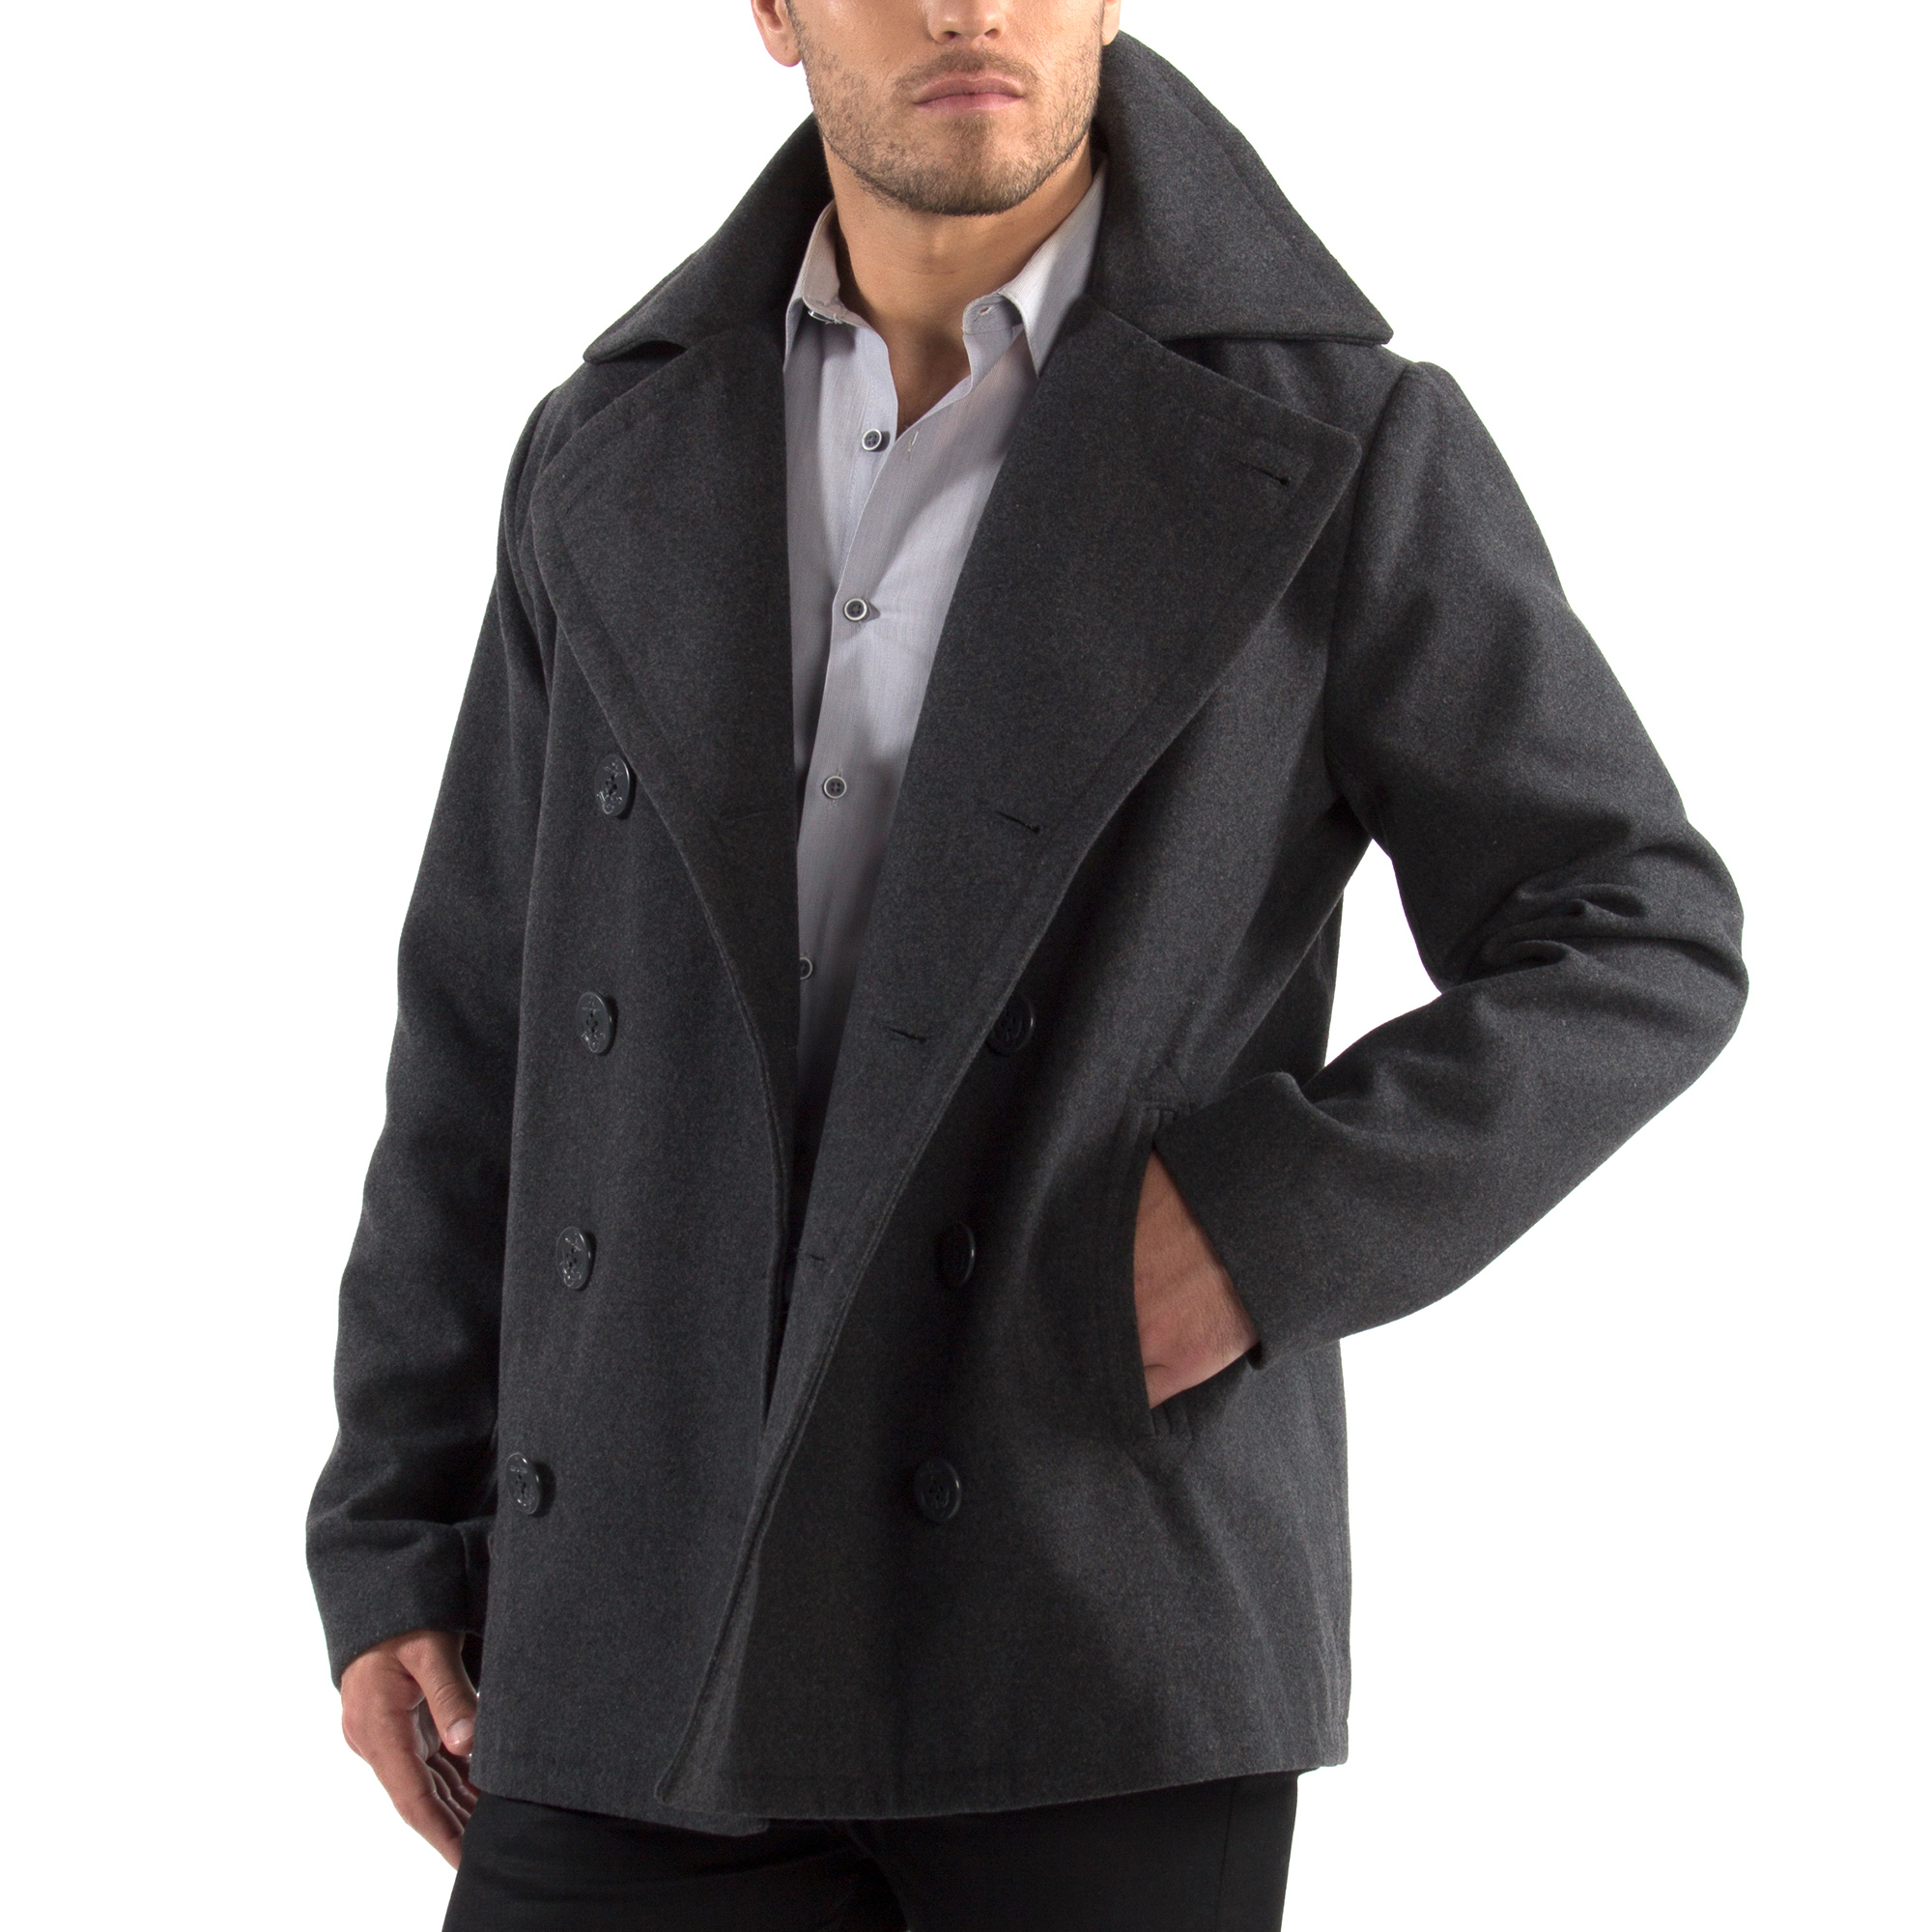 Alpine-Swiss-Mason-Mens-Wool-Blend-Pea-Coat-Jacket-Double-Breasted-Dress-Coat thumbnail 27